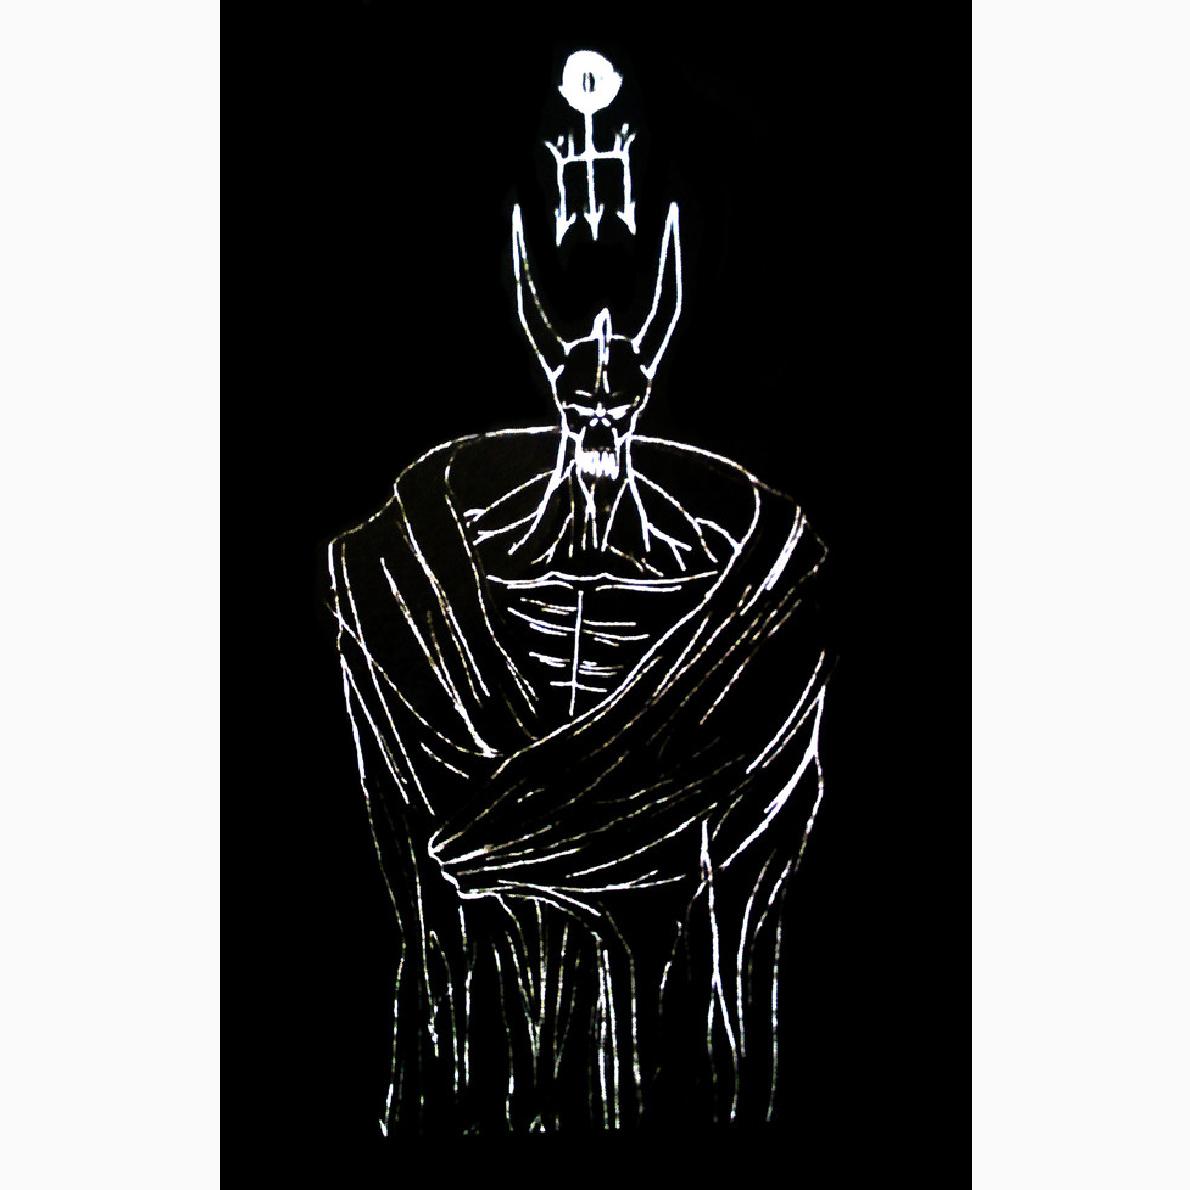 IGNII HATIS - Apêndice Infernal II